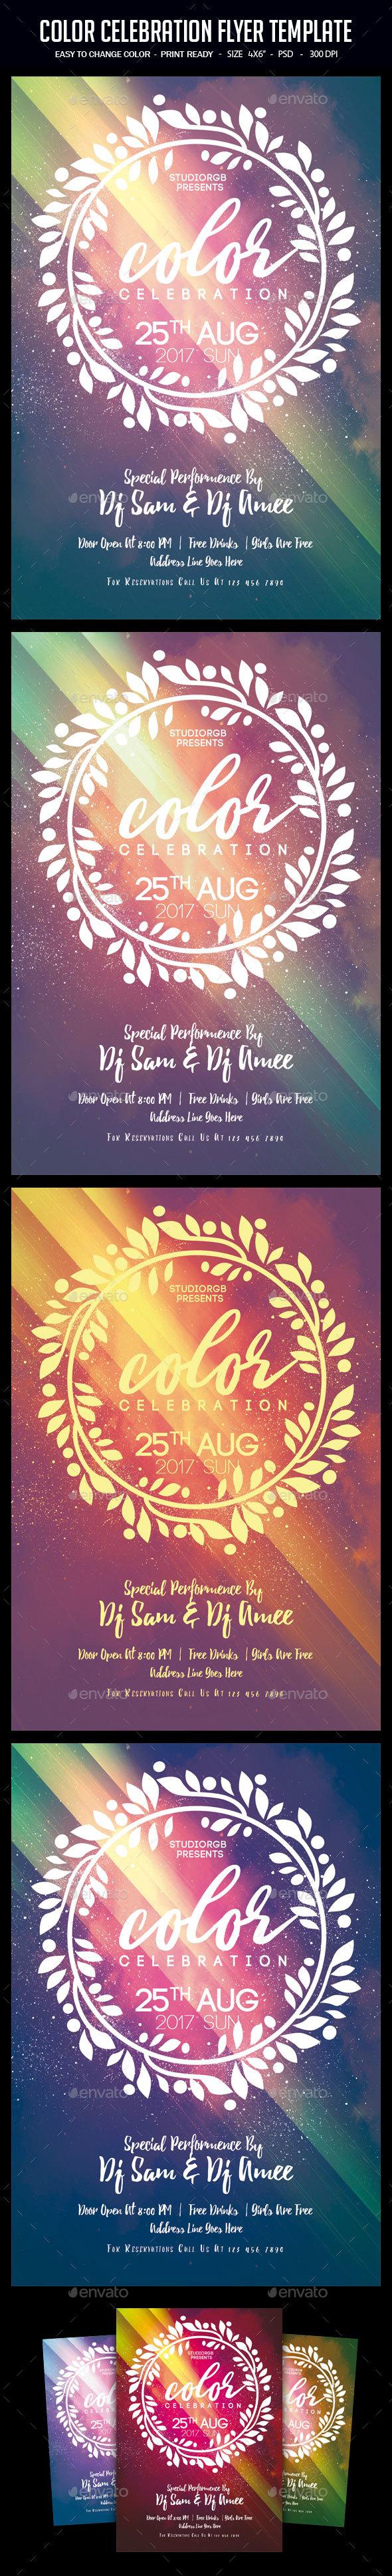 Color Celebration Flyer Template - Clubs & Parties Events